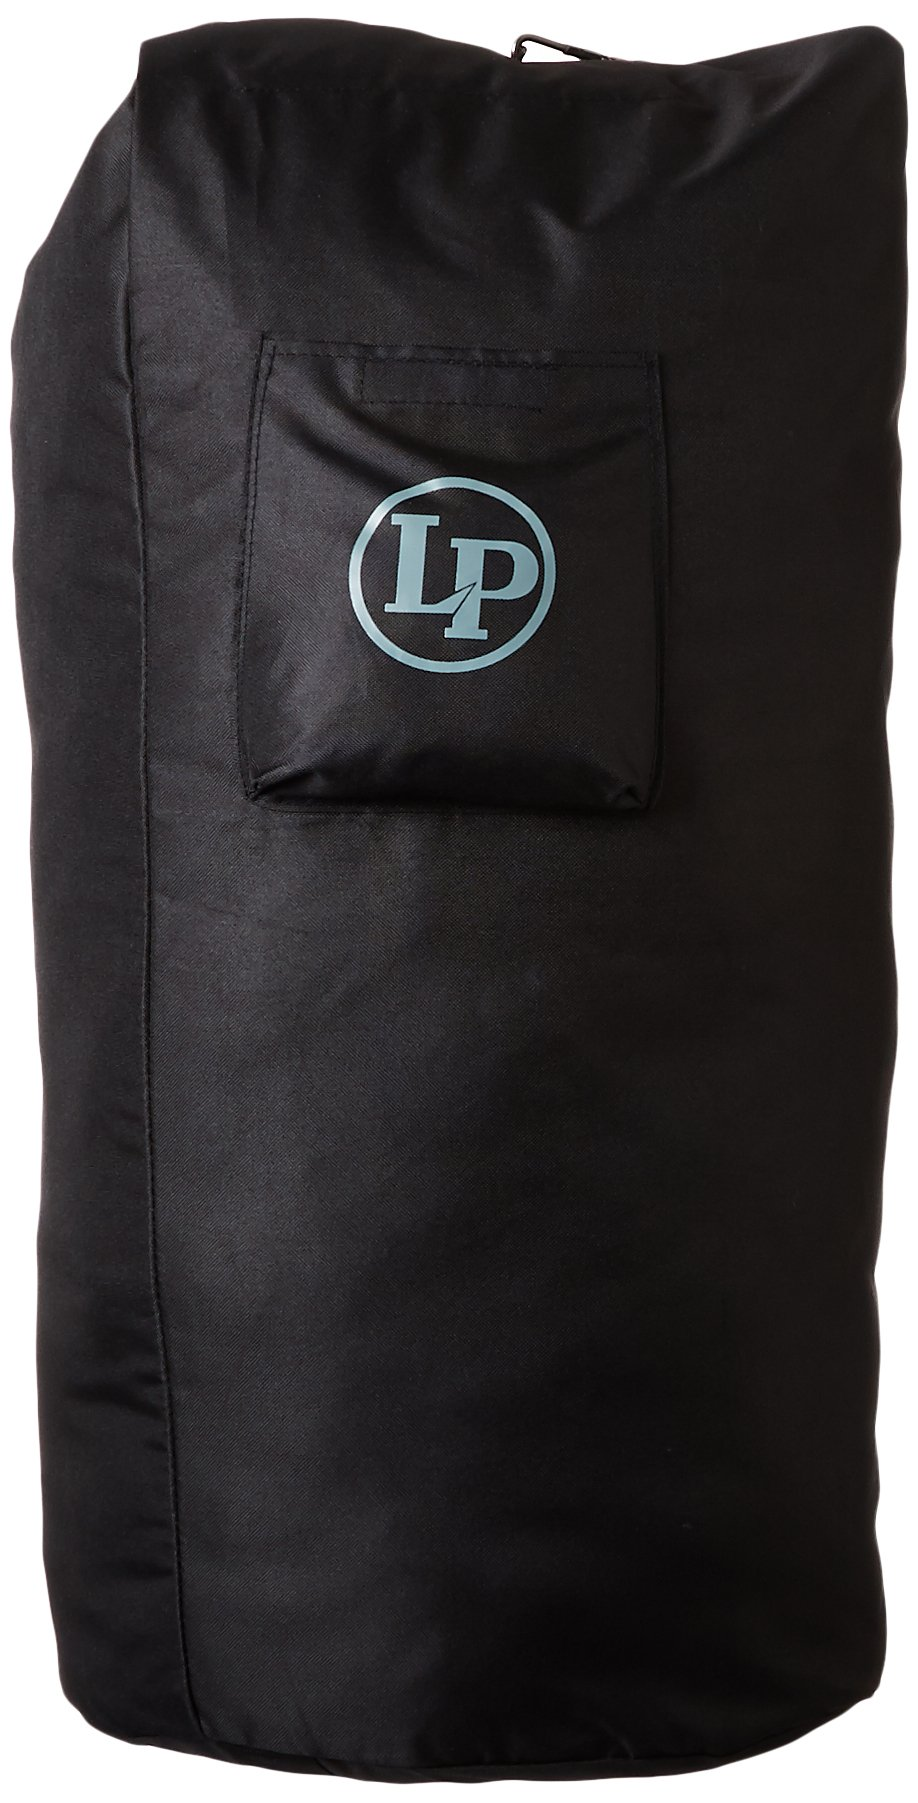 Latin Percussion LP542-BK LP Fits-All Conga Bag